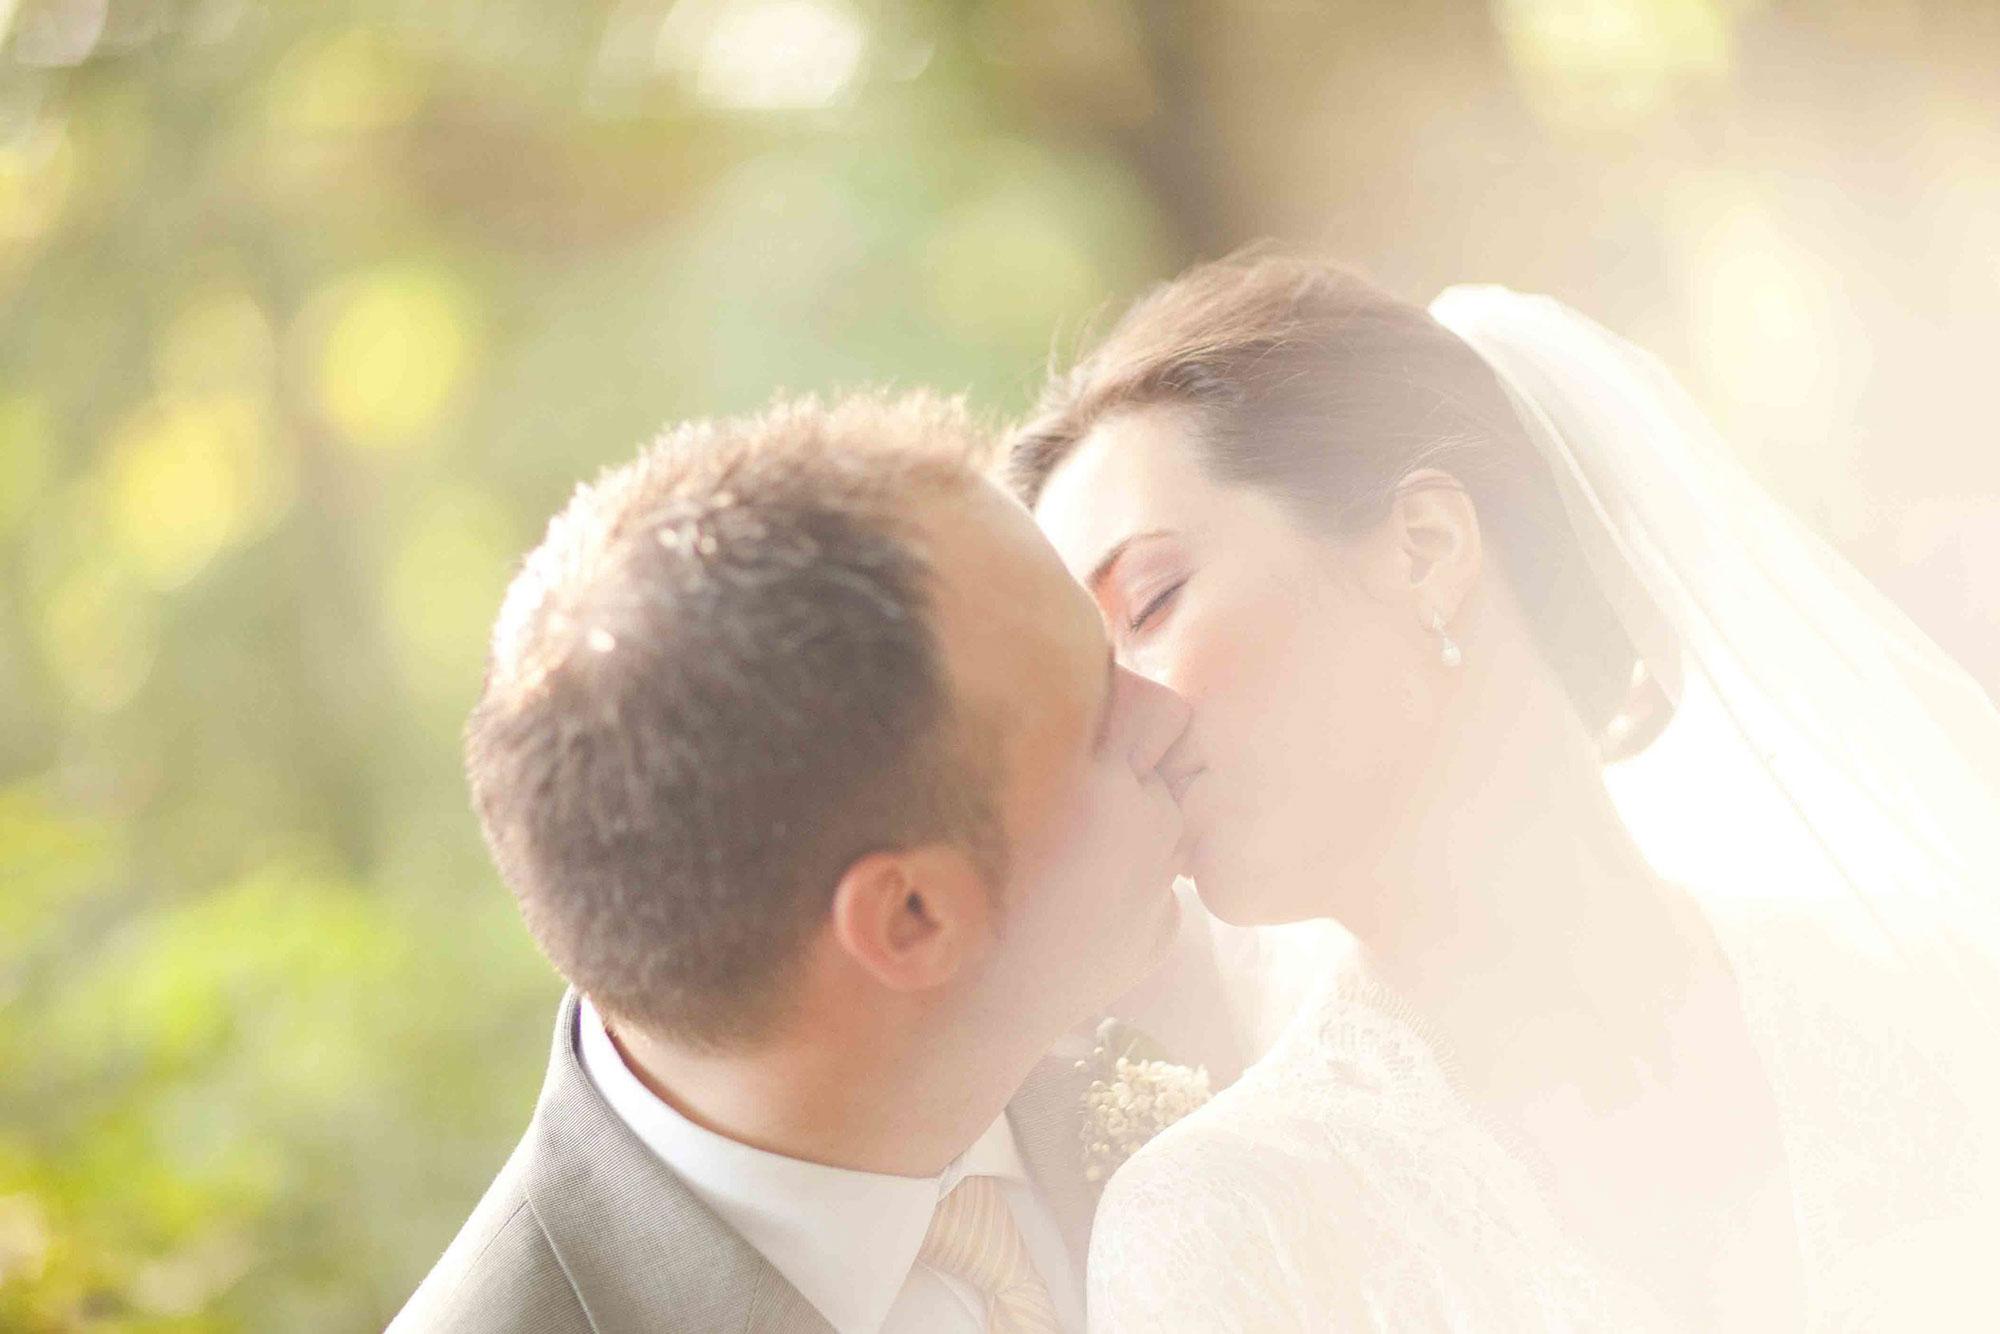 Amanda-Cowley-Willowbank-Vineyard-Bride-Photo-By-White-Photographie-039.jpg